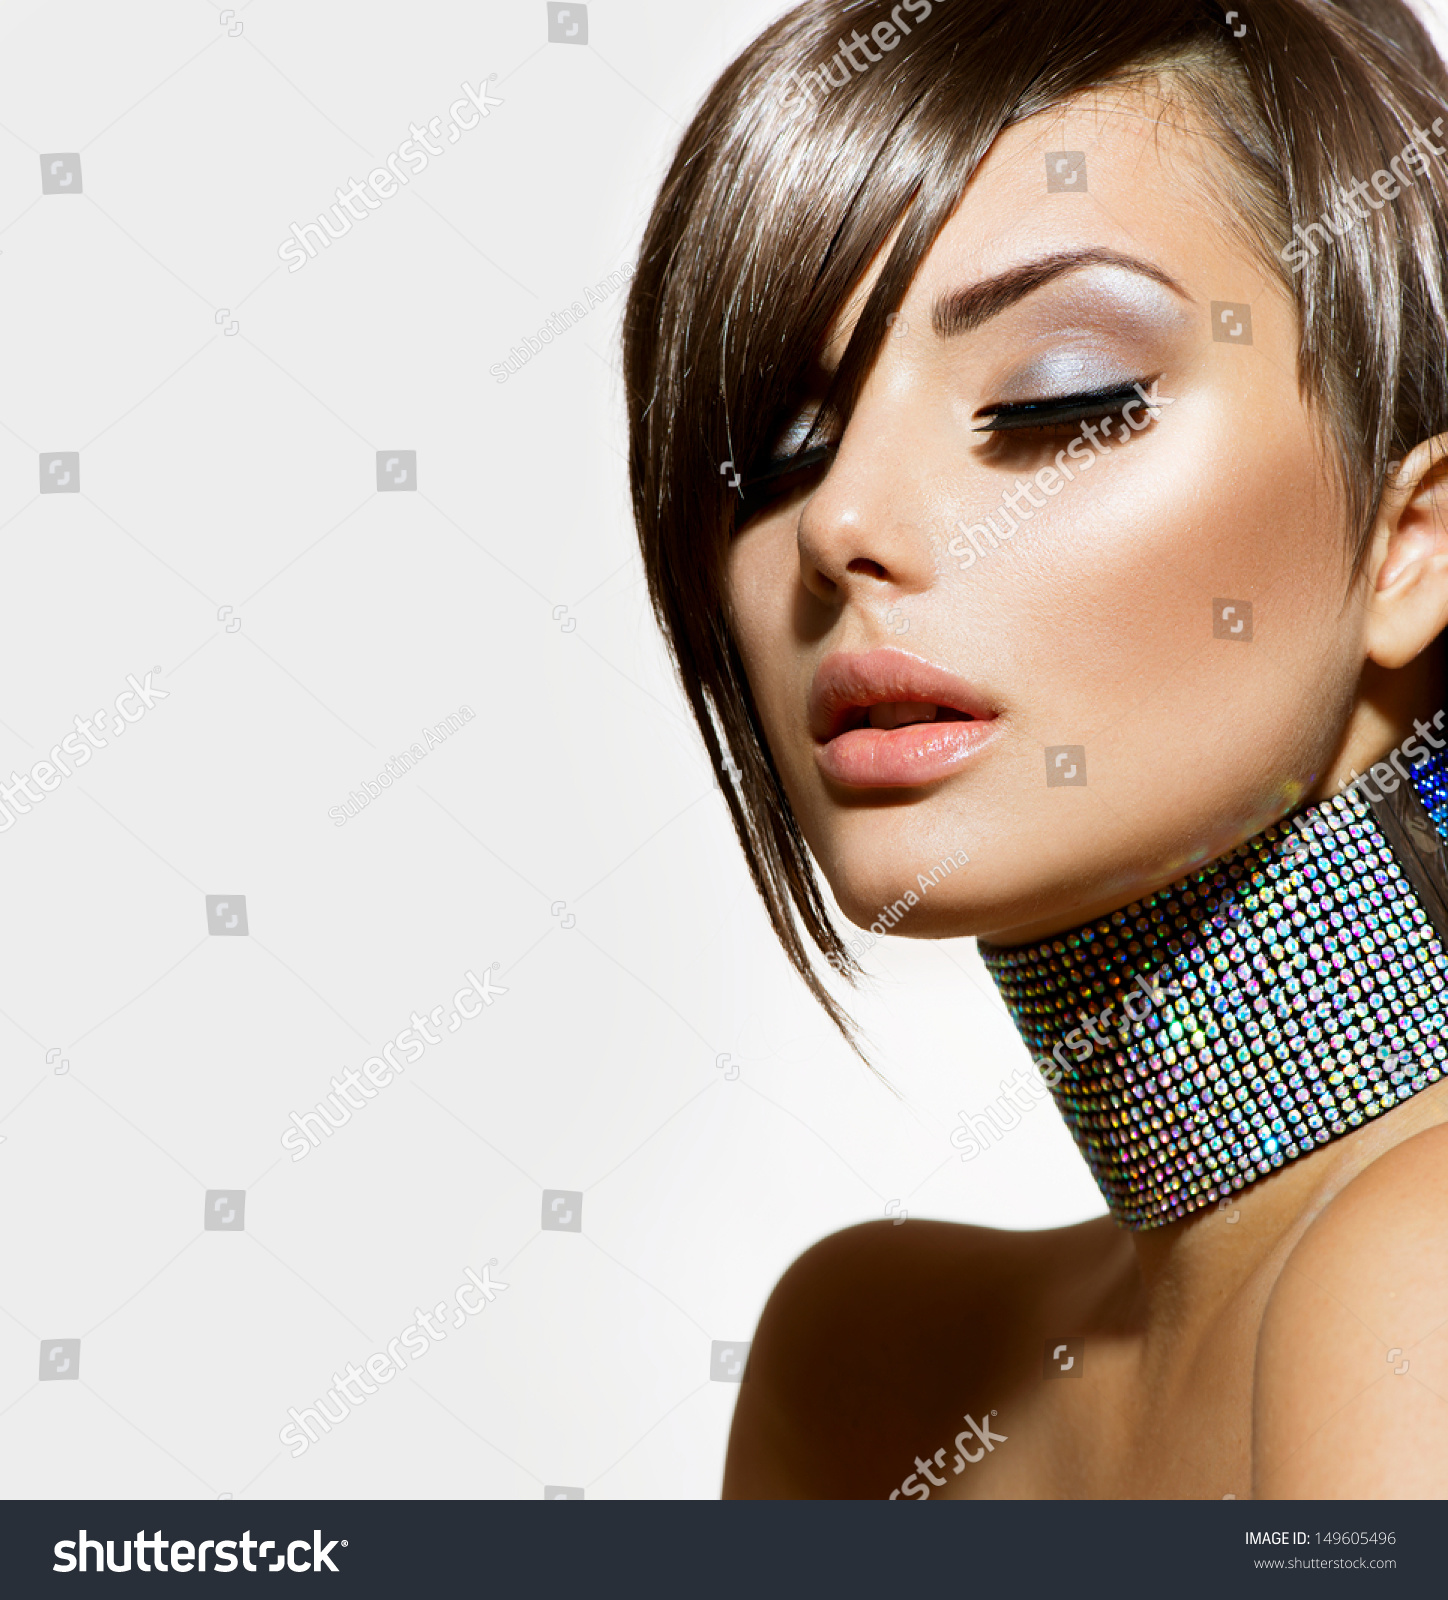 Fashion Beauty Girl Gorgeous Woman Portrait Stylish Haircut And Makeup Hairstyle Make Up